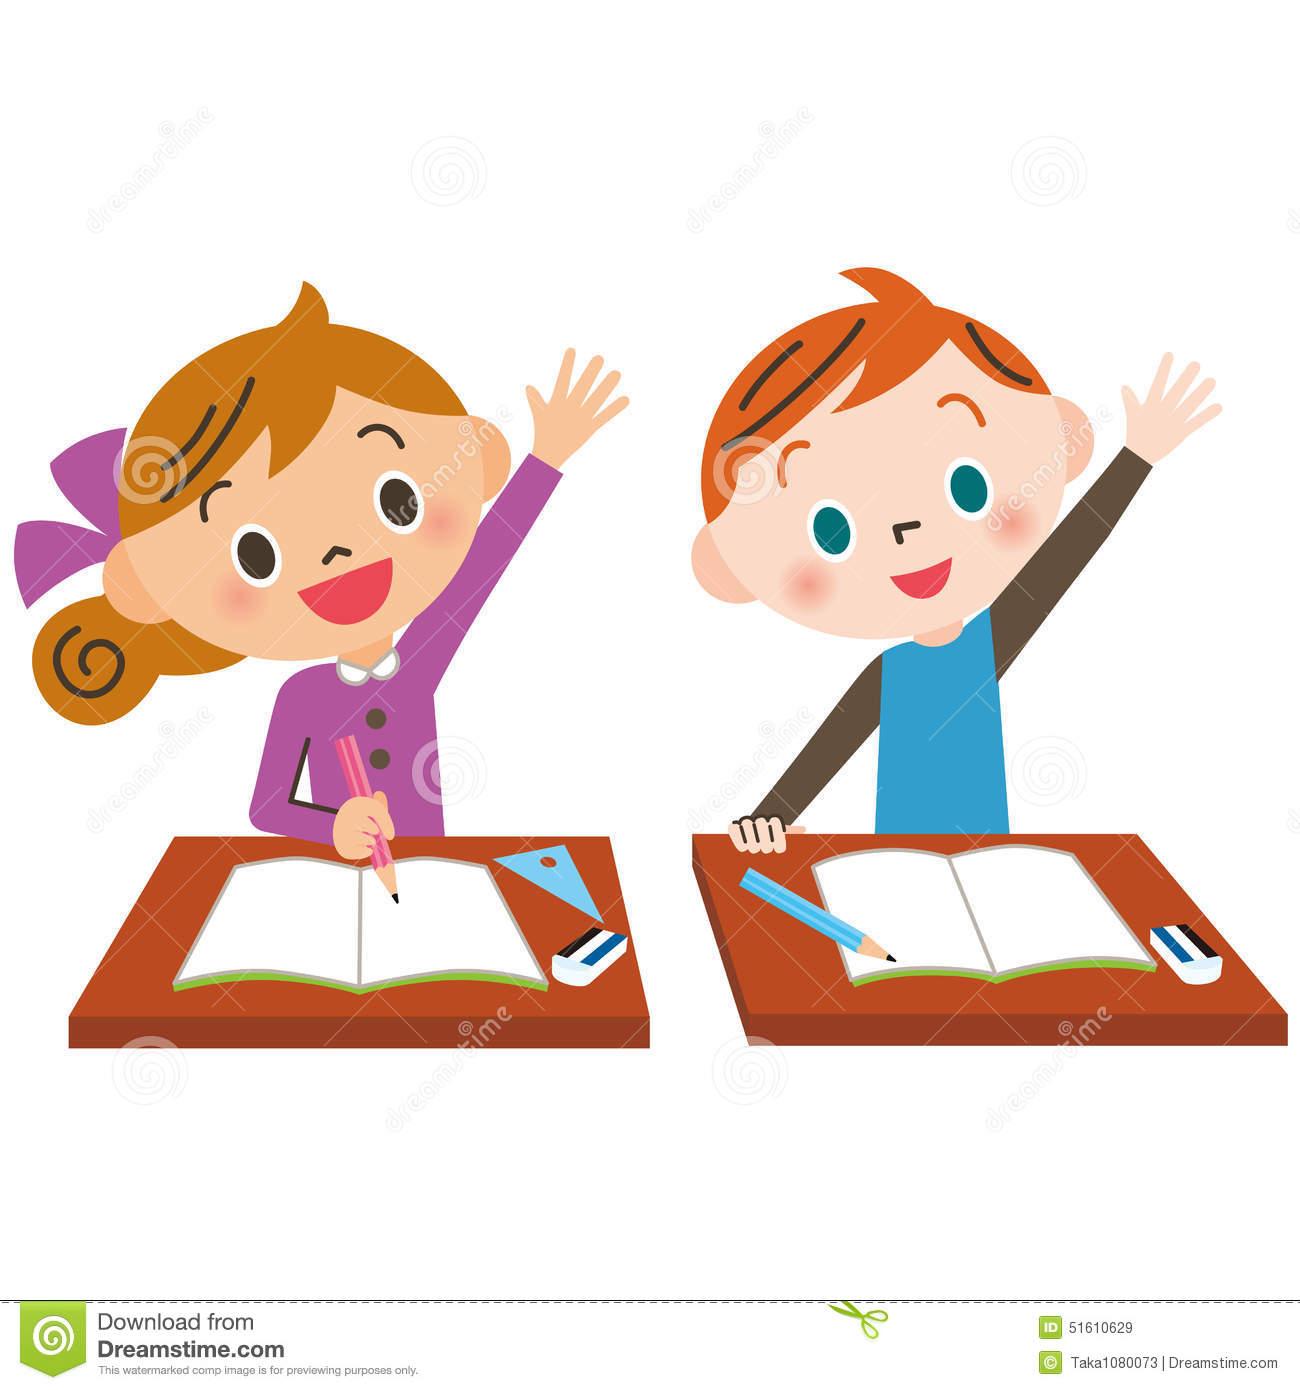 Children Hands up Clipart (58+).